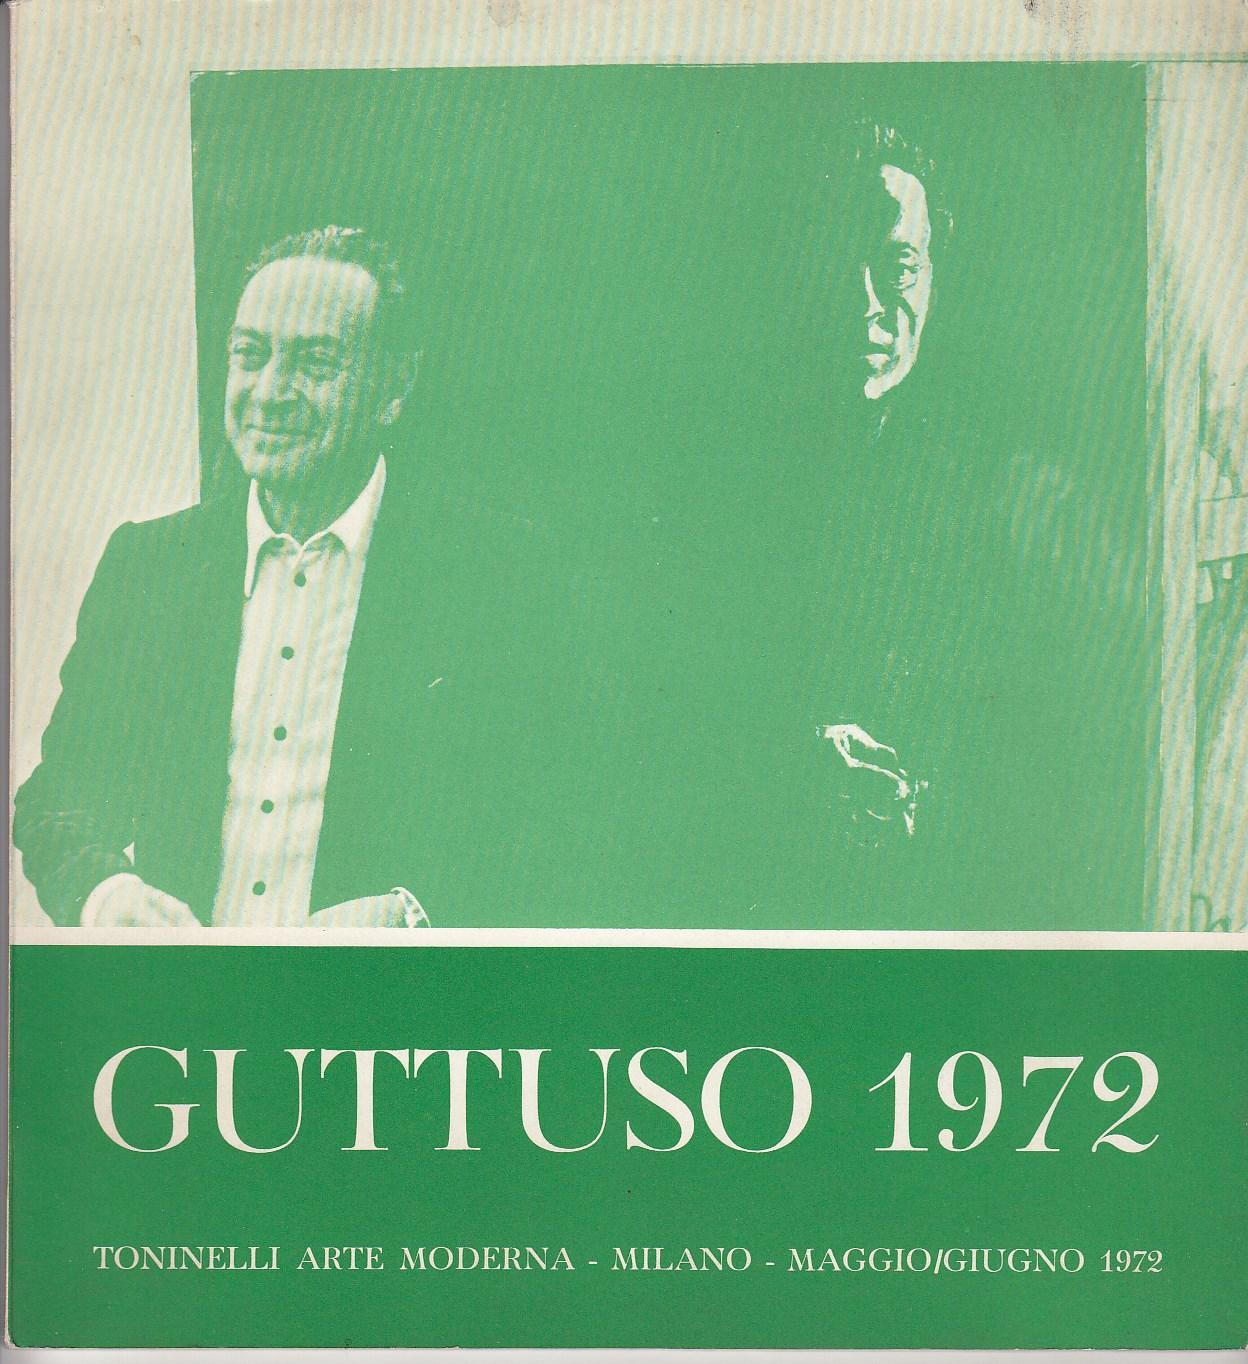 GUTTUSO, Renato. Guttuso 1972.